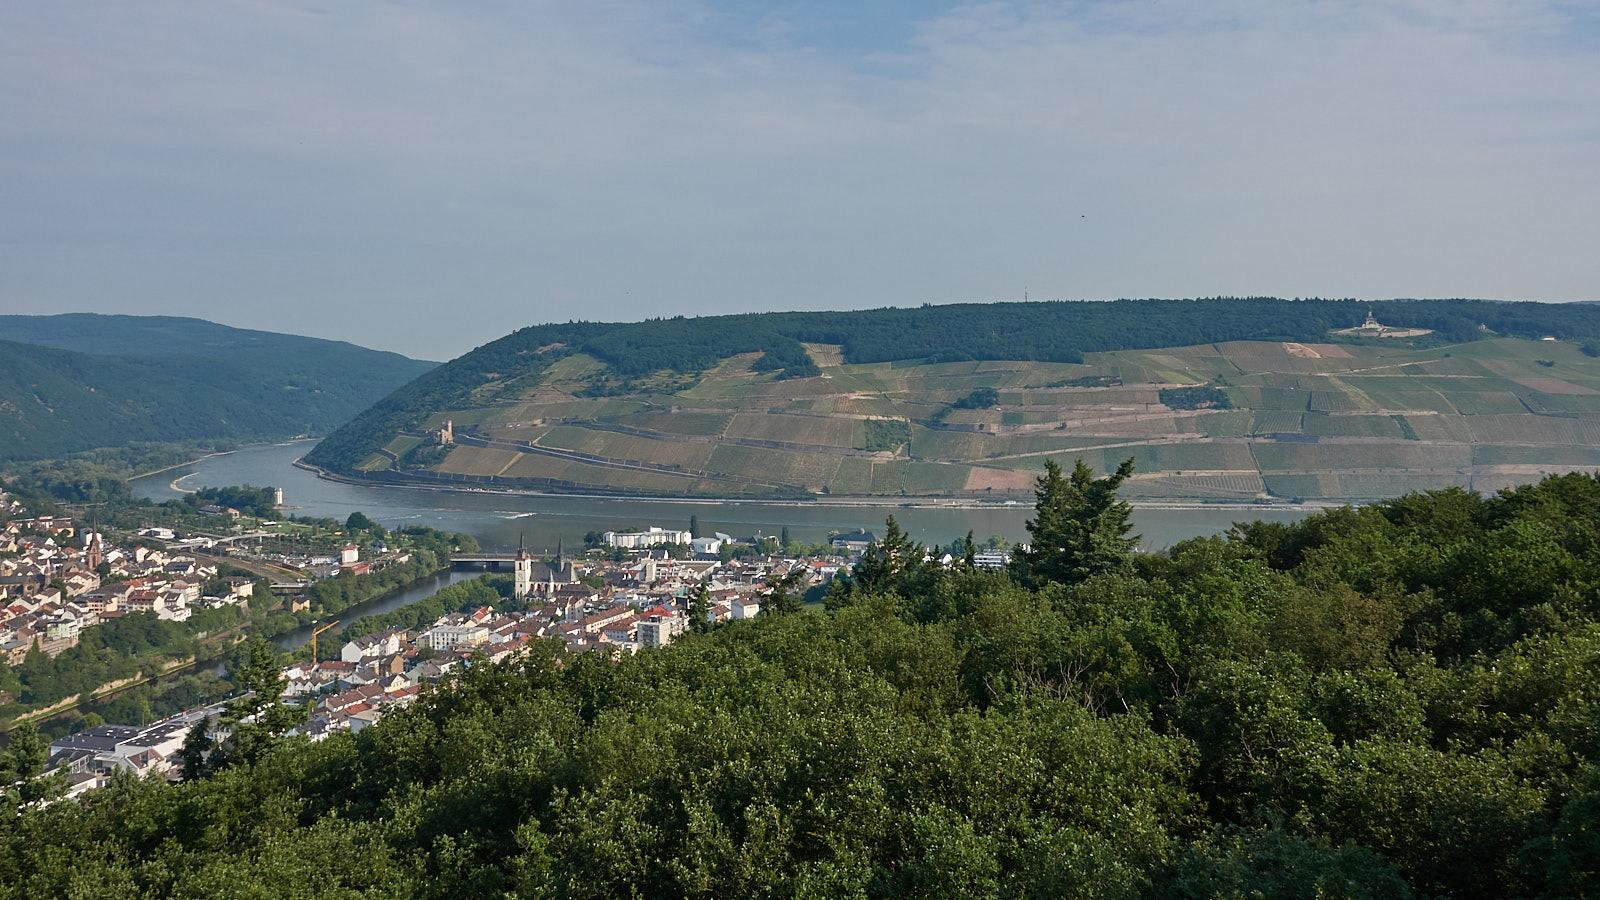 Wandern in Rheinhessen - cover